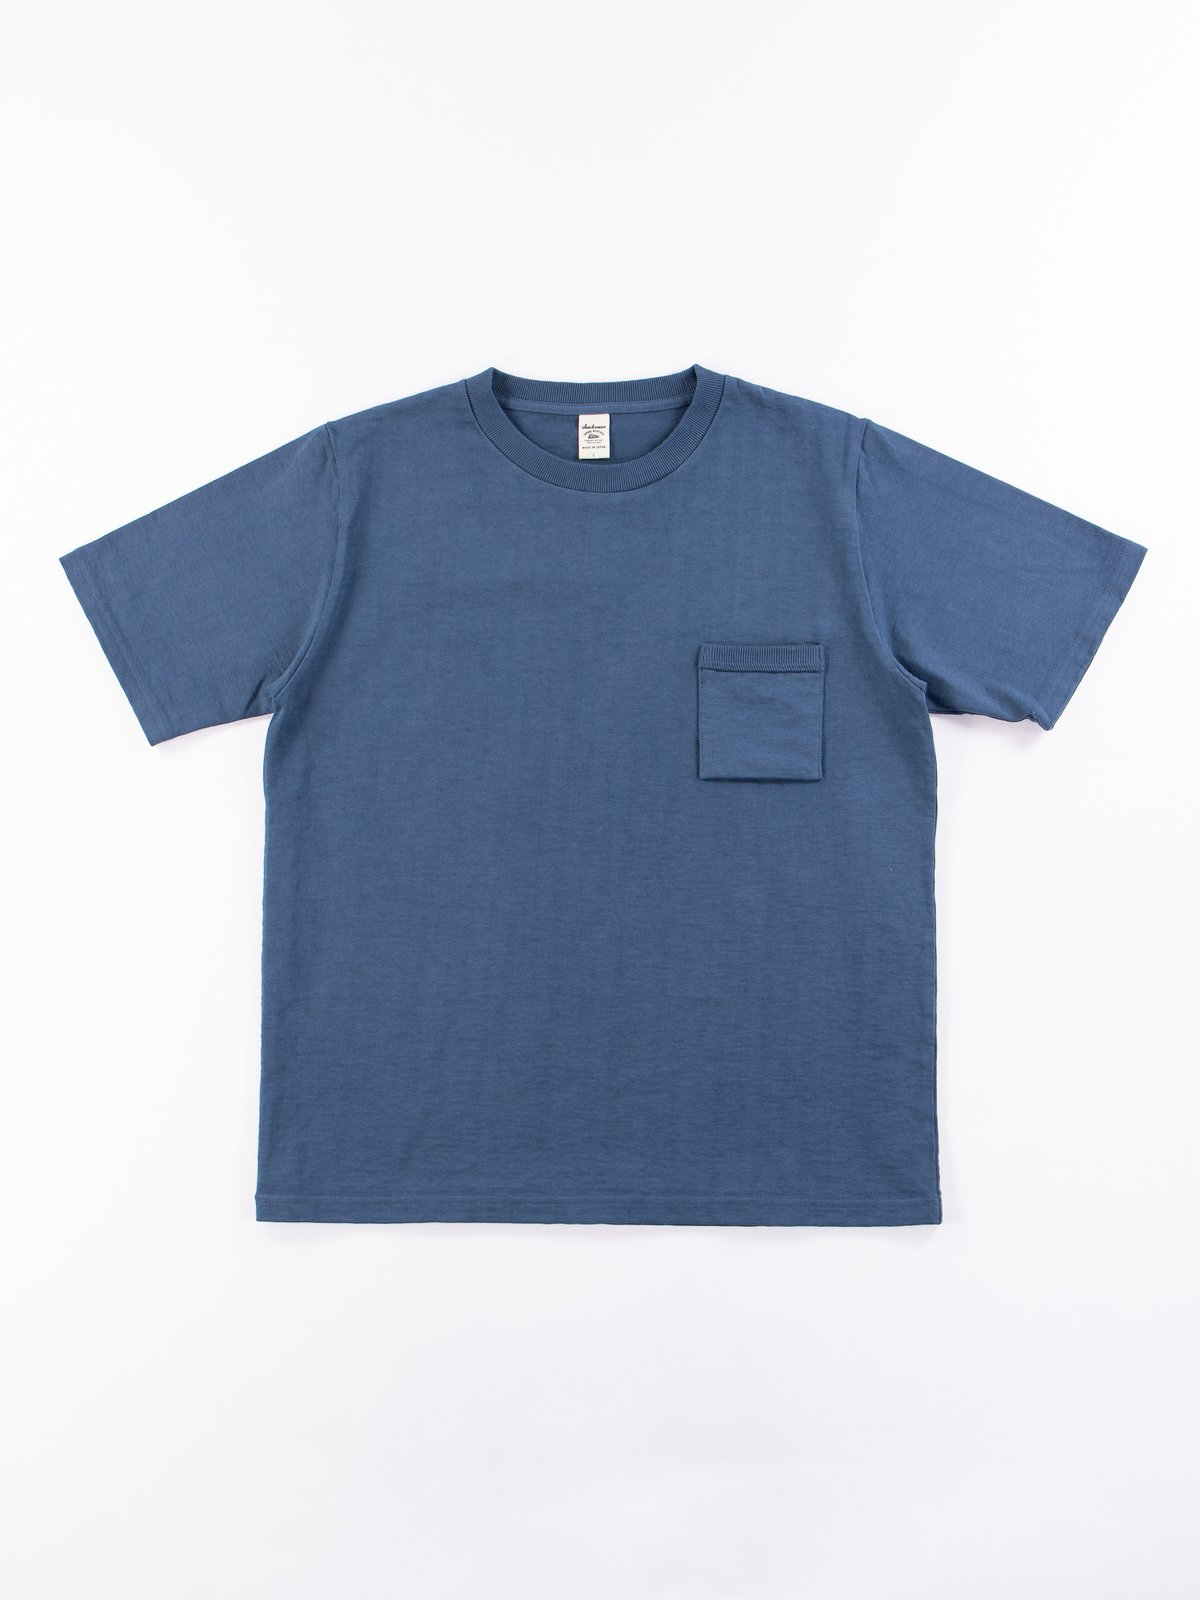 Ash Blue Dotsume Pocket T–Shirt - Image 1